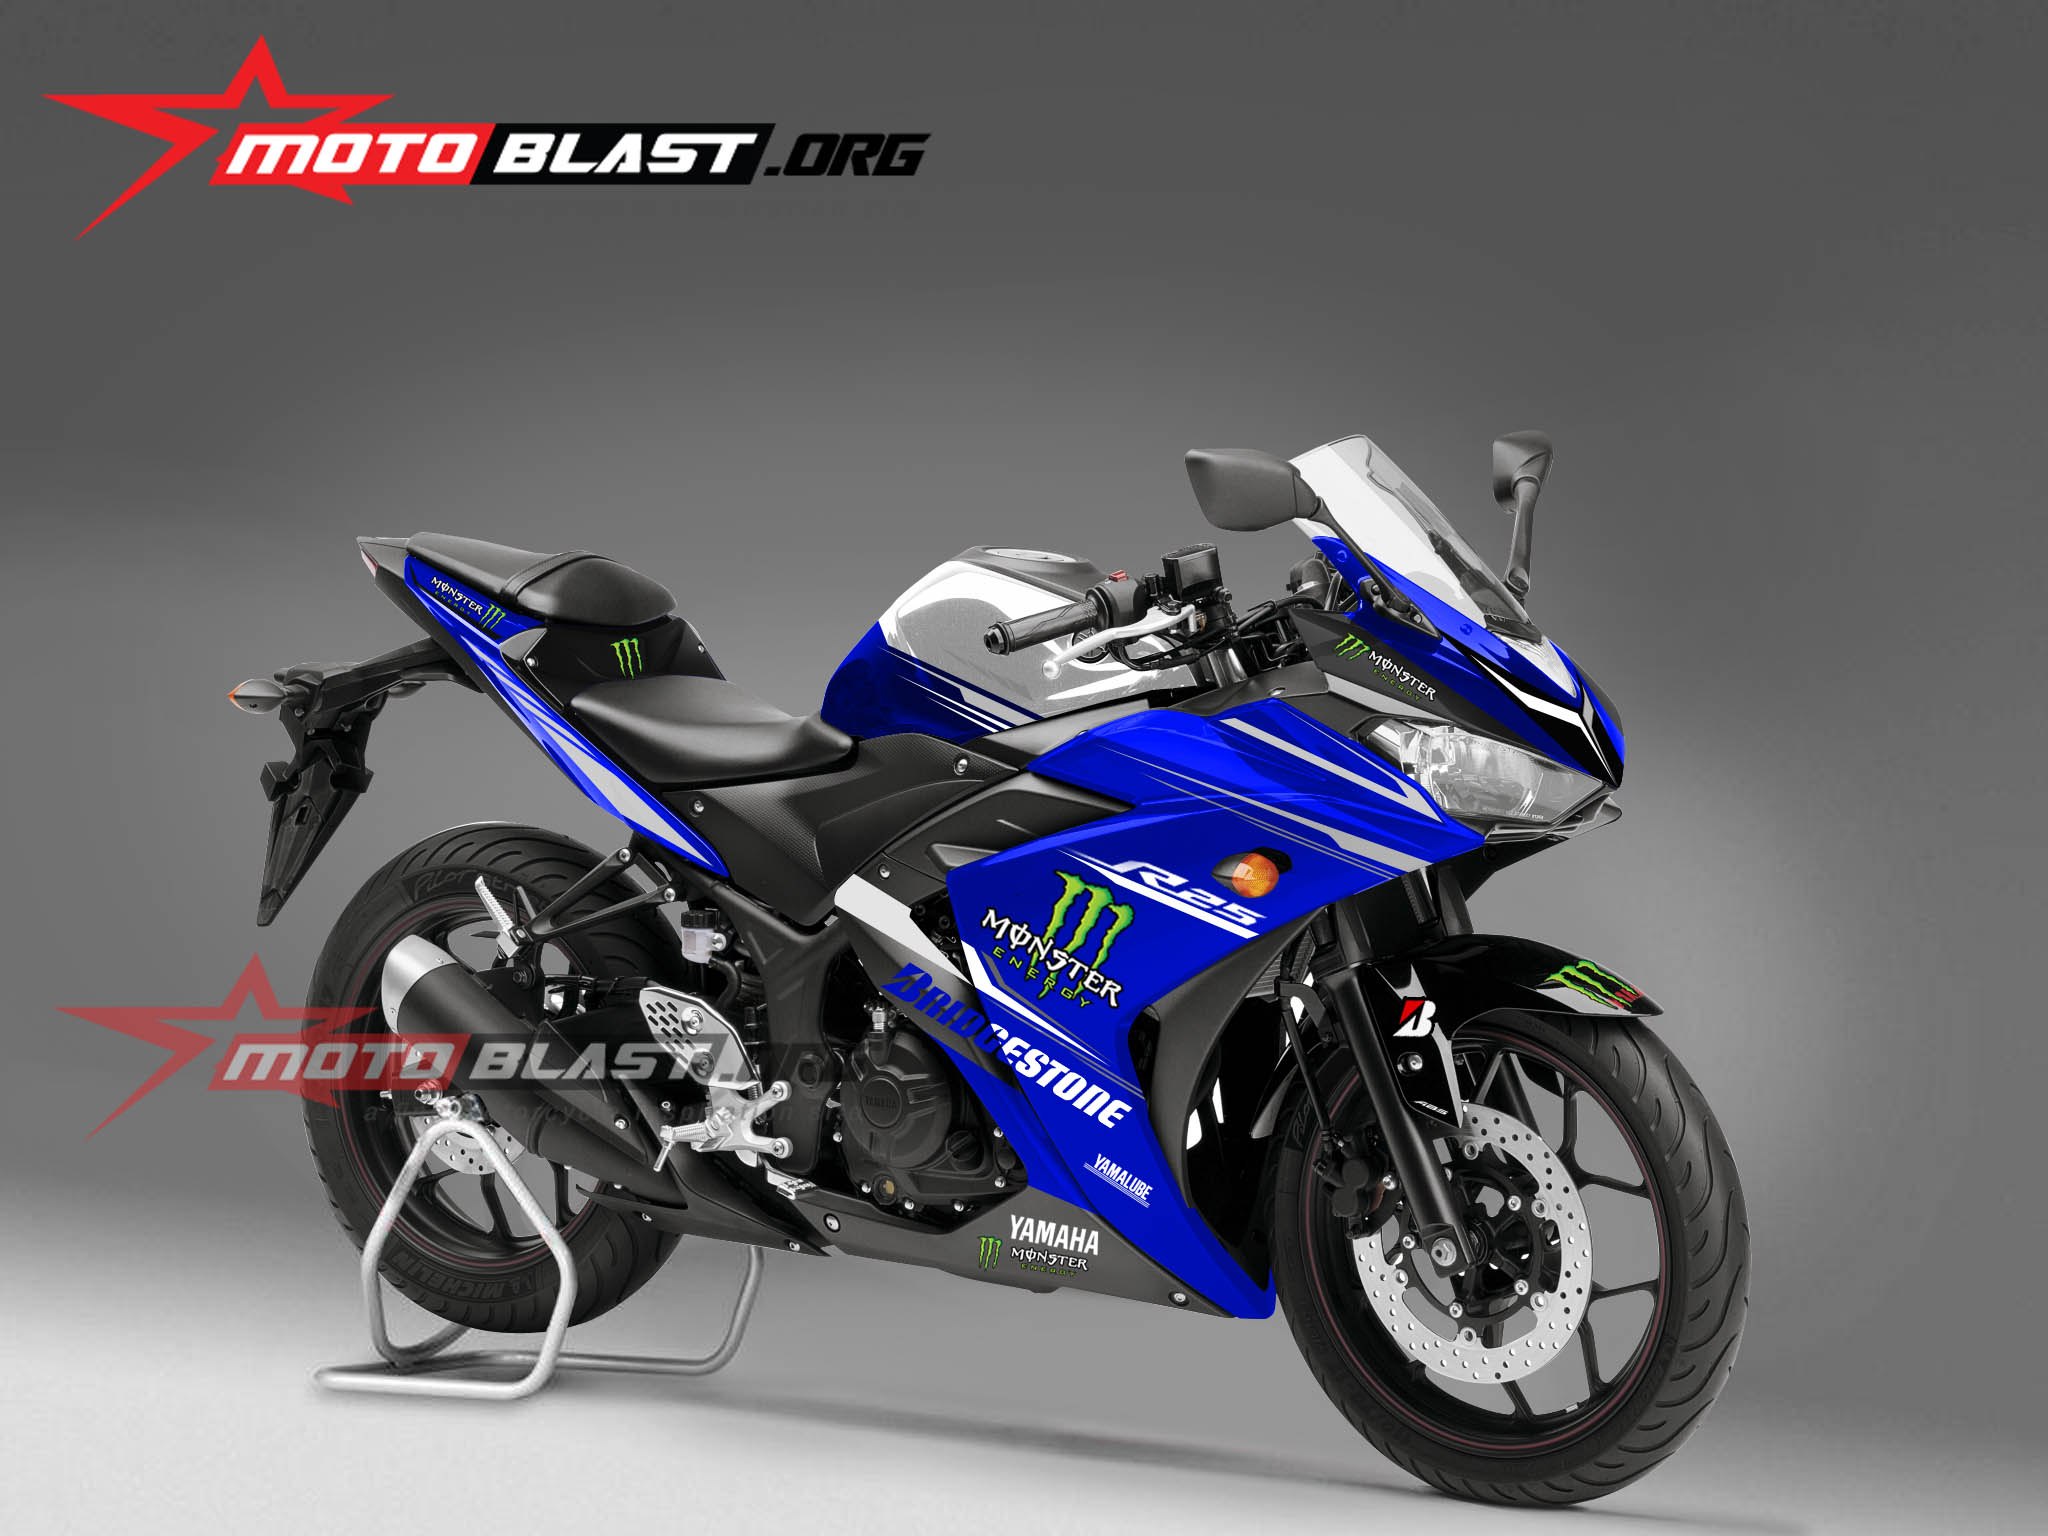 modif striping yamaha  blue monster  motoblast